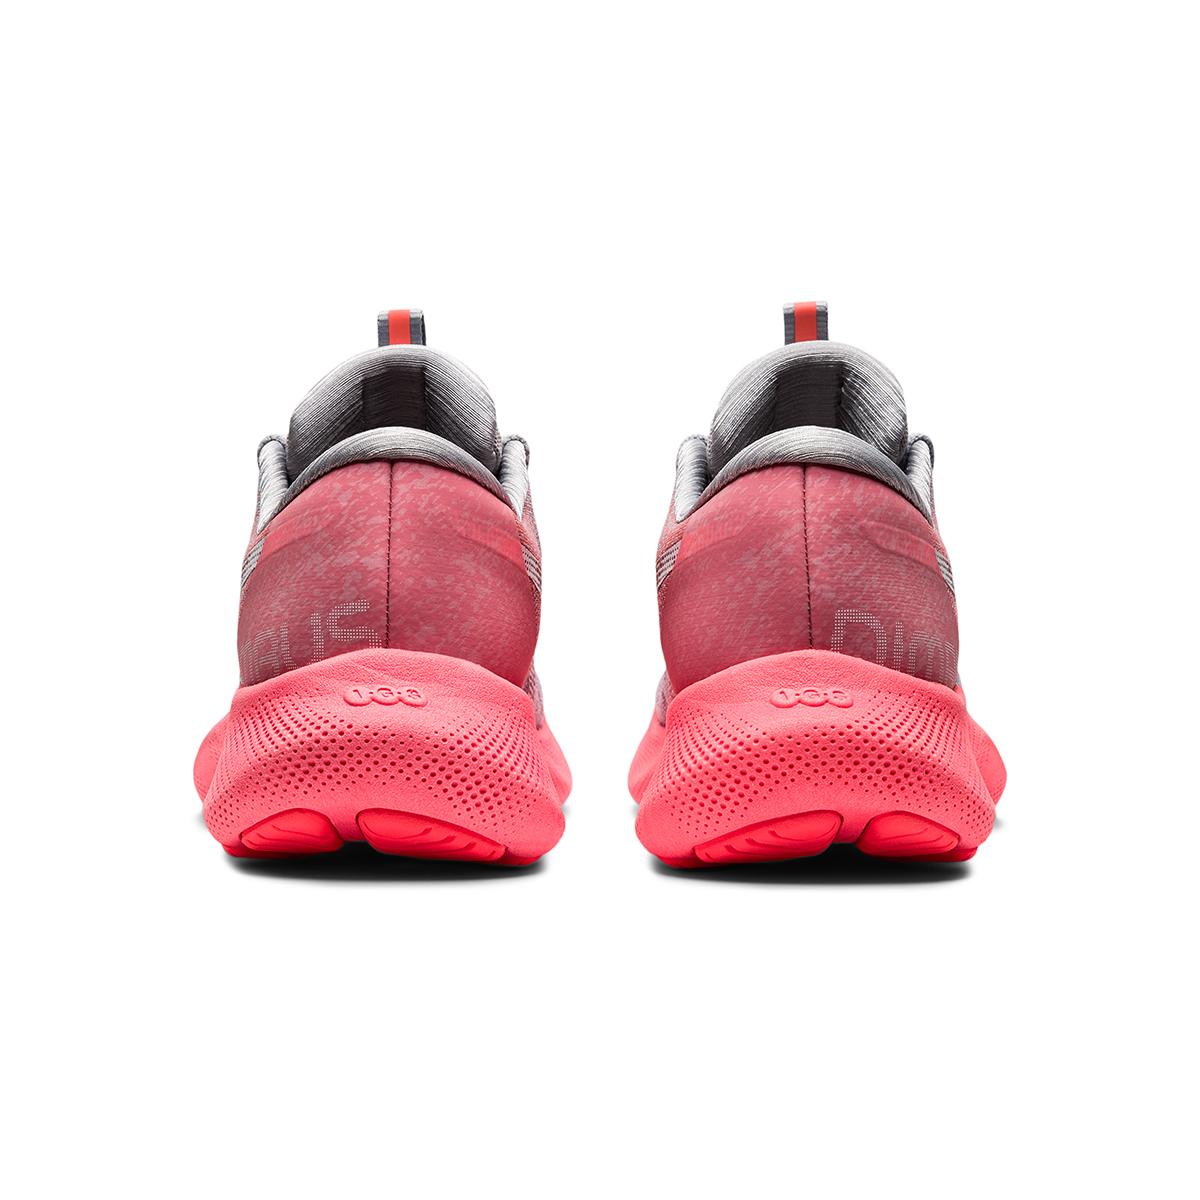 Women's Asics Gel-Nimbus Lite 2 Running Shoe - Color: Blazing Coral  - Size: 5 - Width: Regular, Blazing Coral, large, image 5